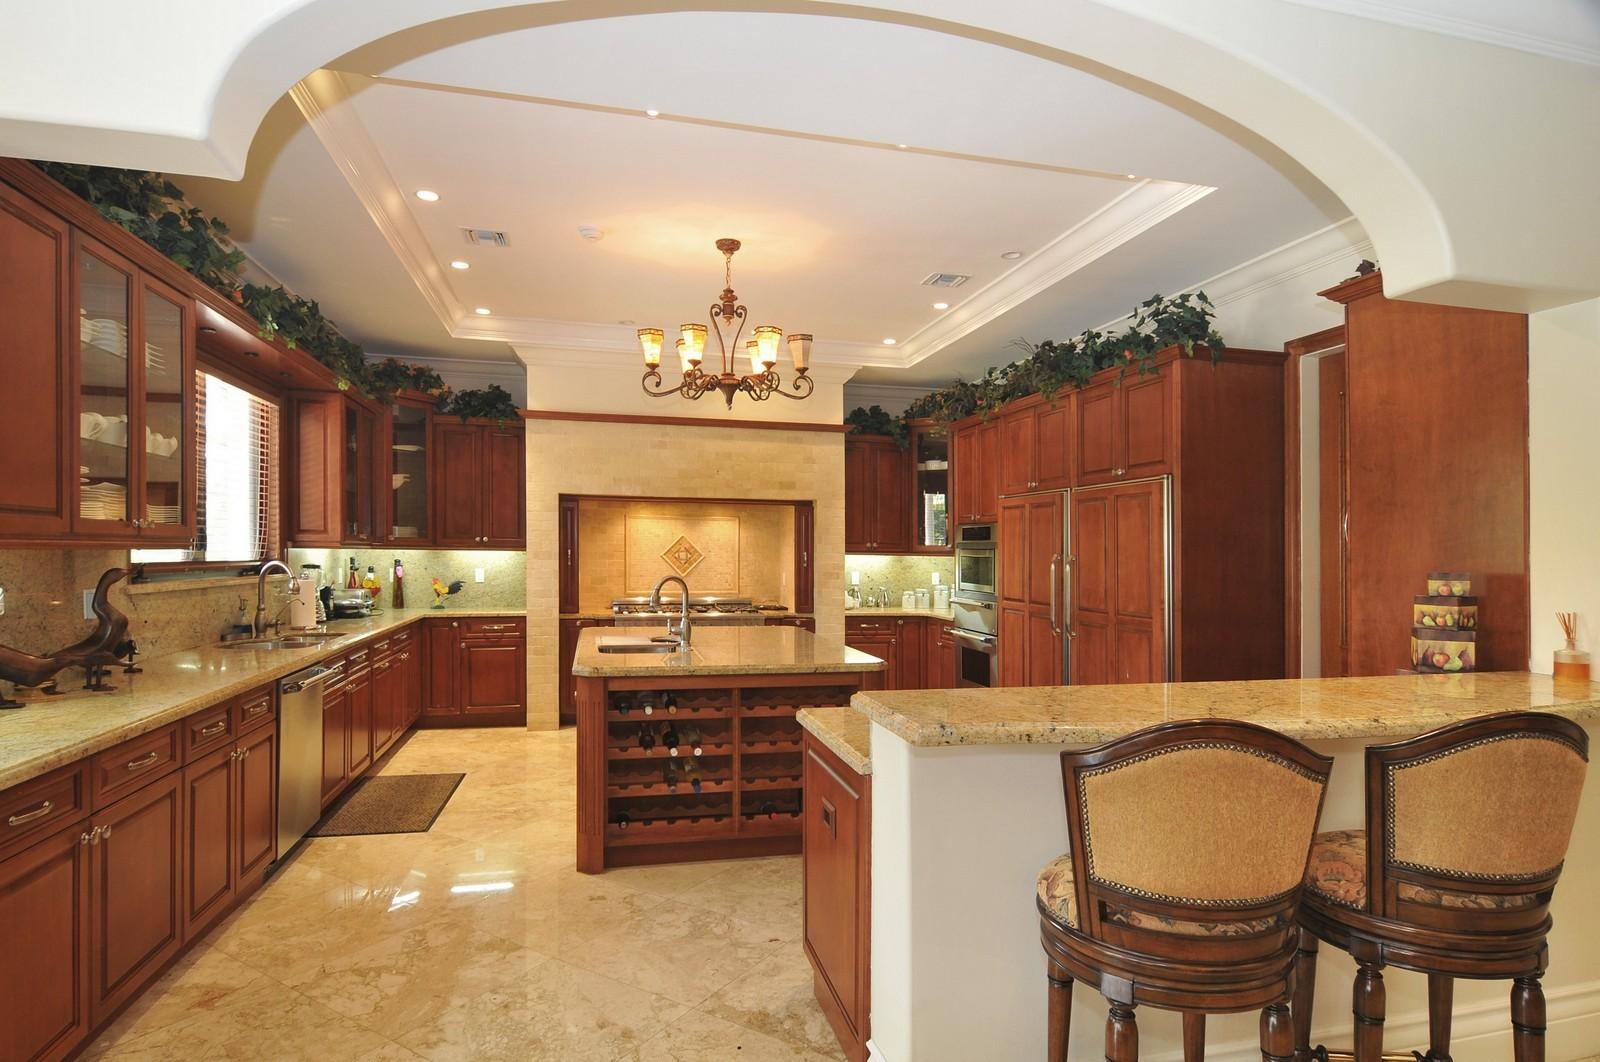 Real Estate Photography - 6270 SW 121st St, Pinecrest, FL, 33156 - Kitchen